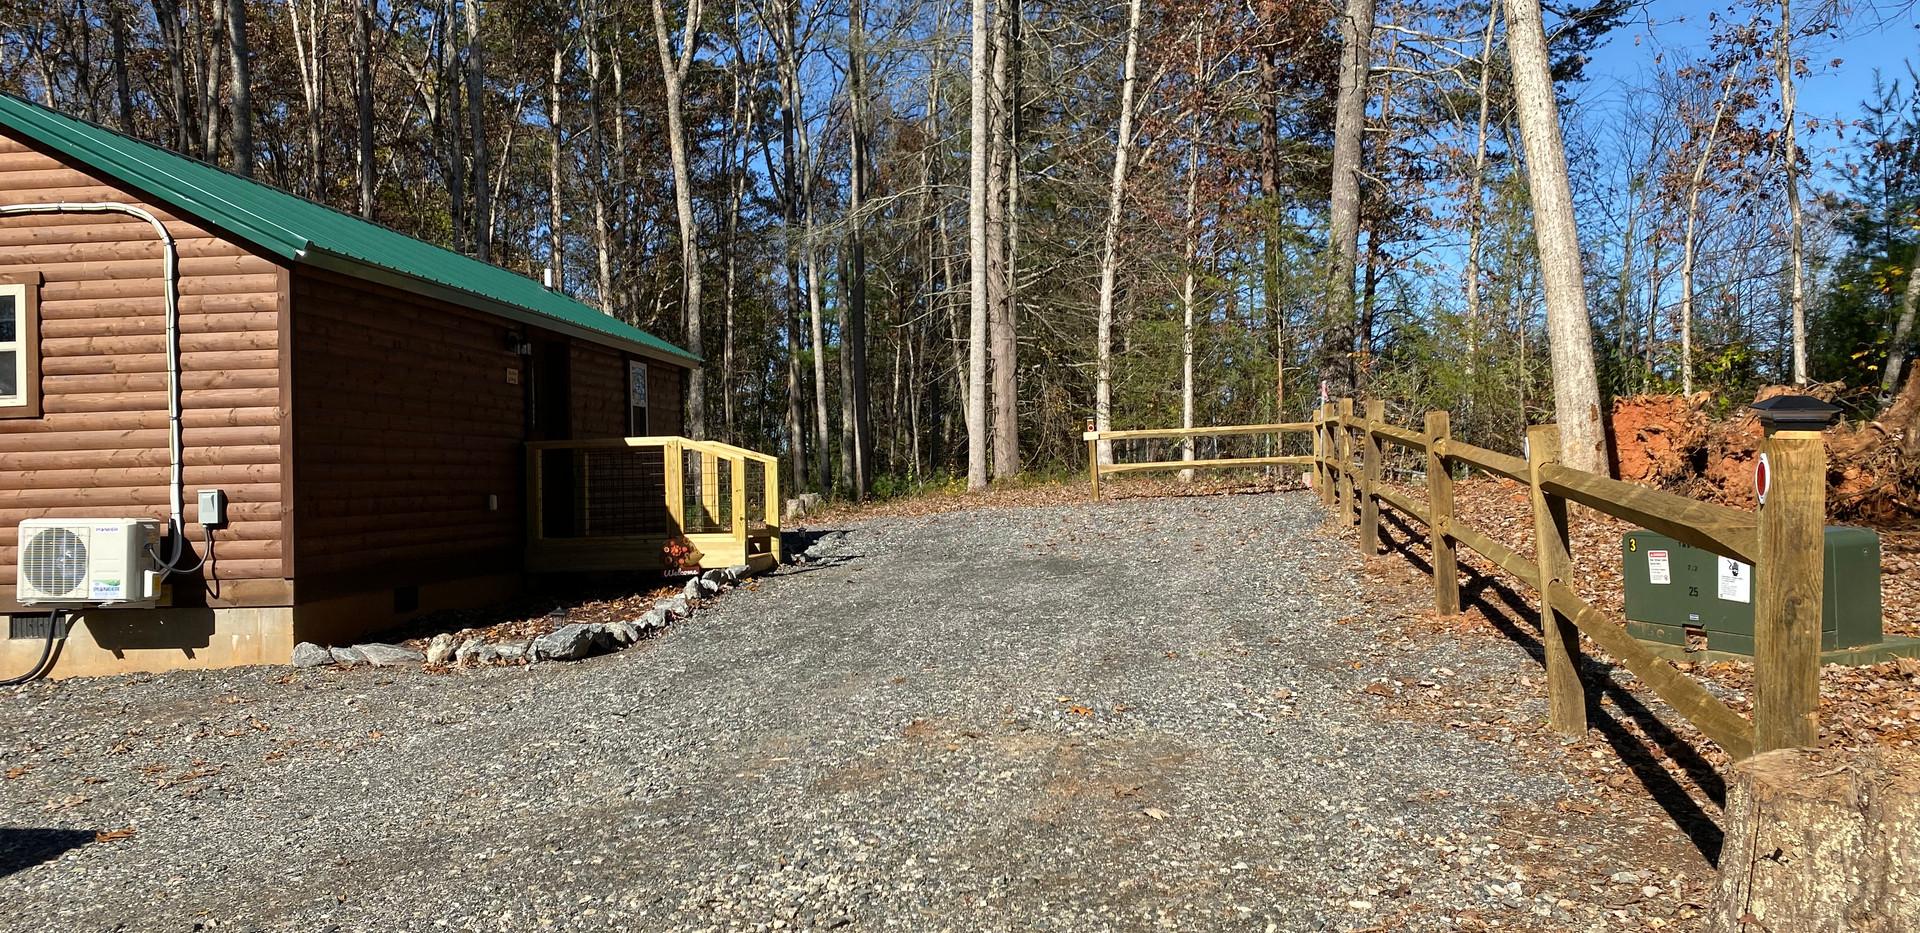 Pine Wood Parking Straight ahead